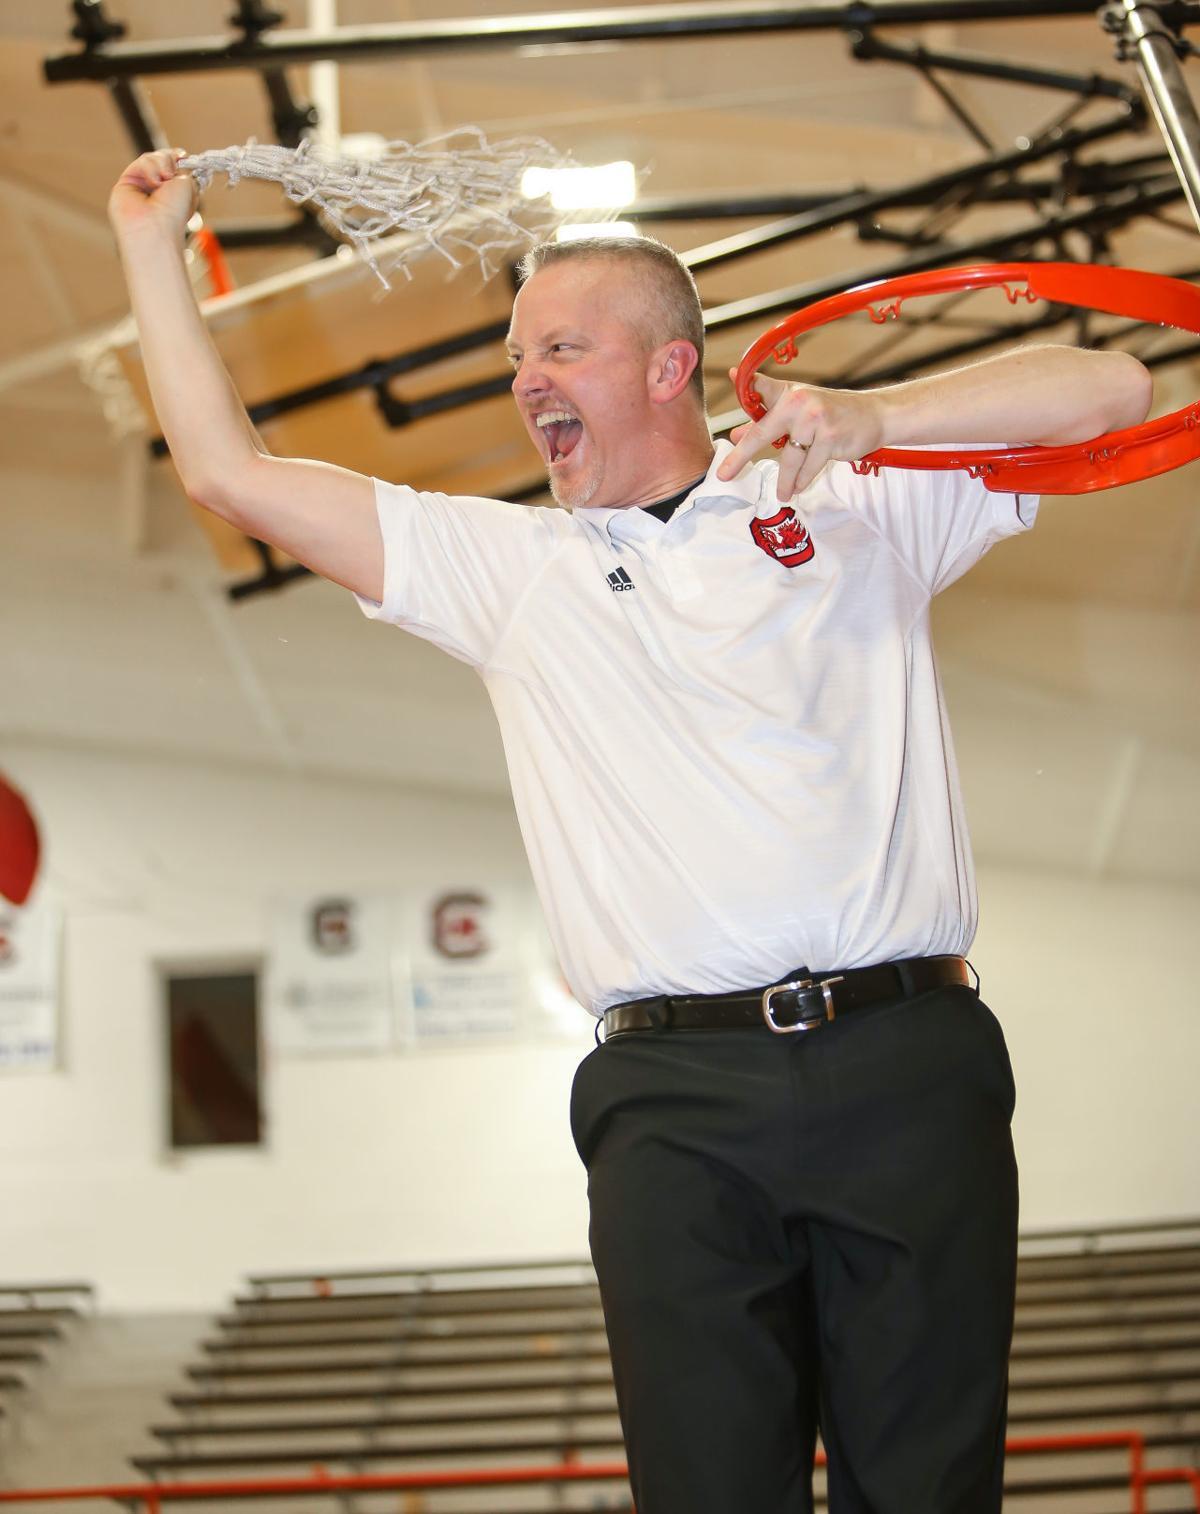 Evans celebrates win (copy)